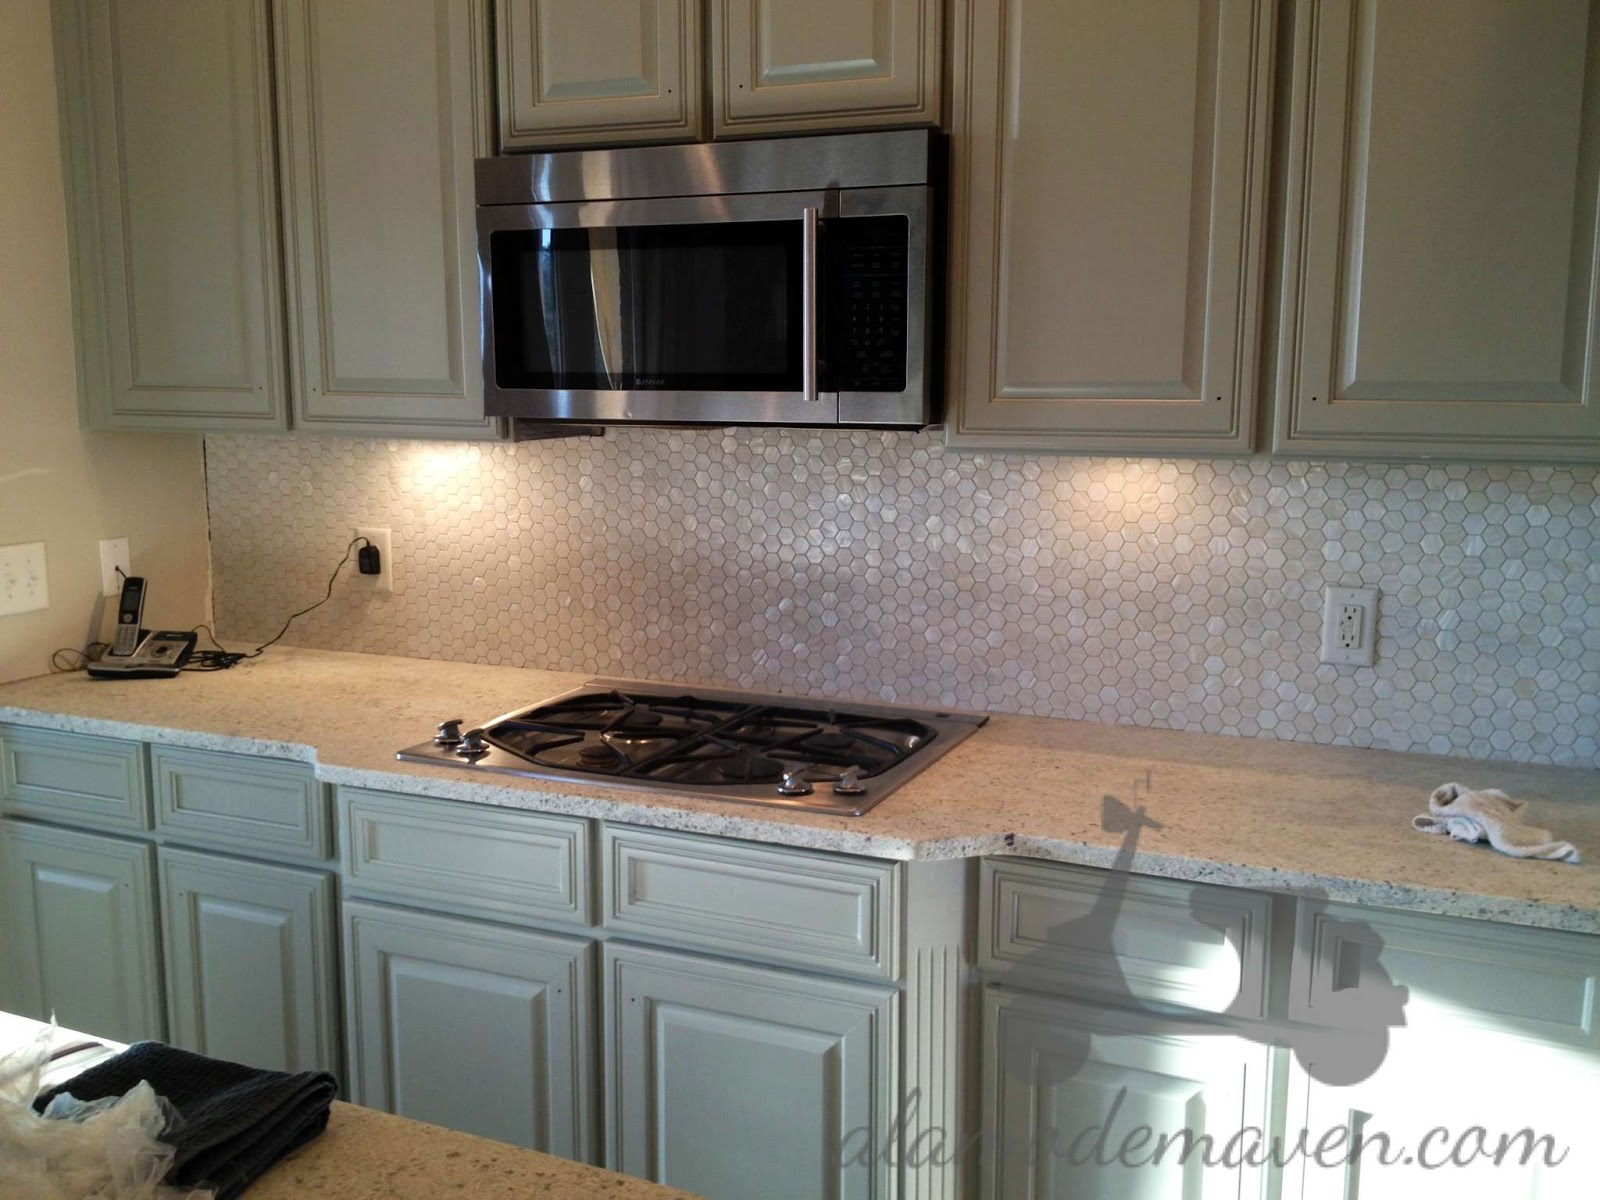 Alamode The New Kitchen Tile Backsplash